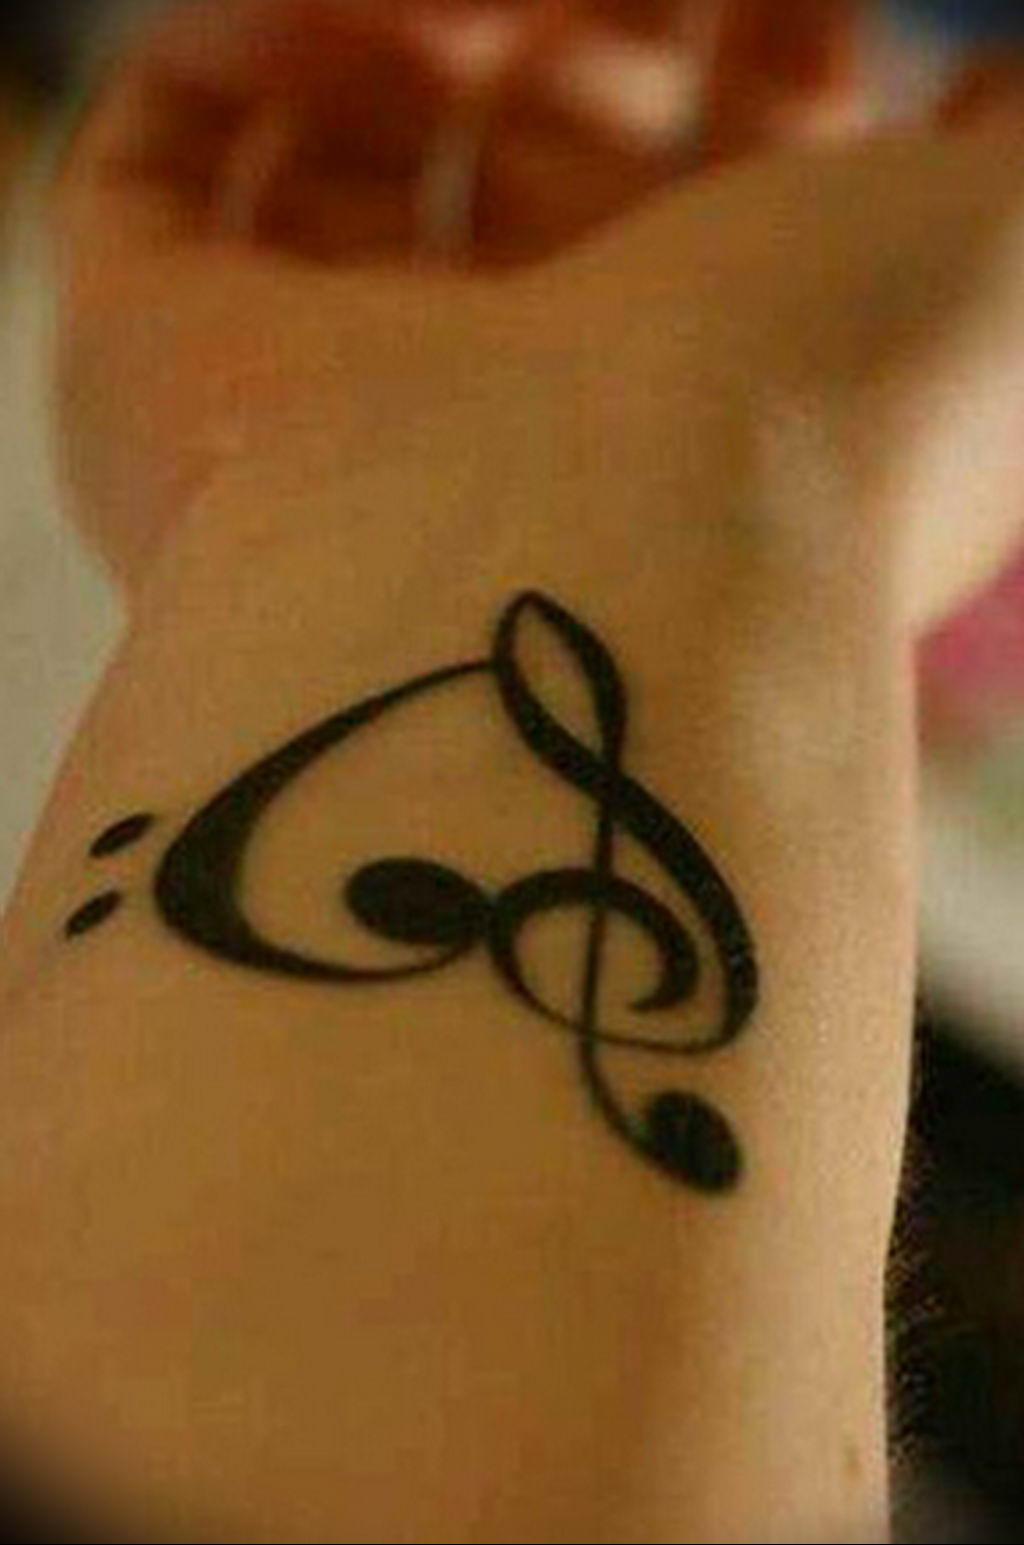 Фото басовый ключ тату 21.08.2019 №054 - bass clef tattoo - tatufoto.com